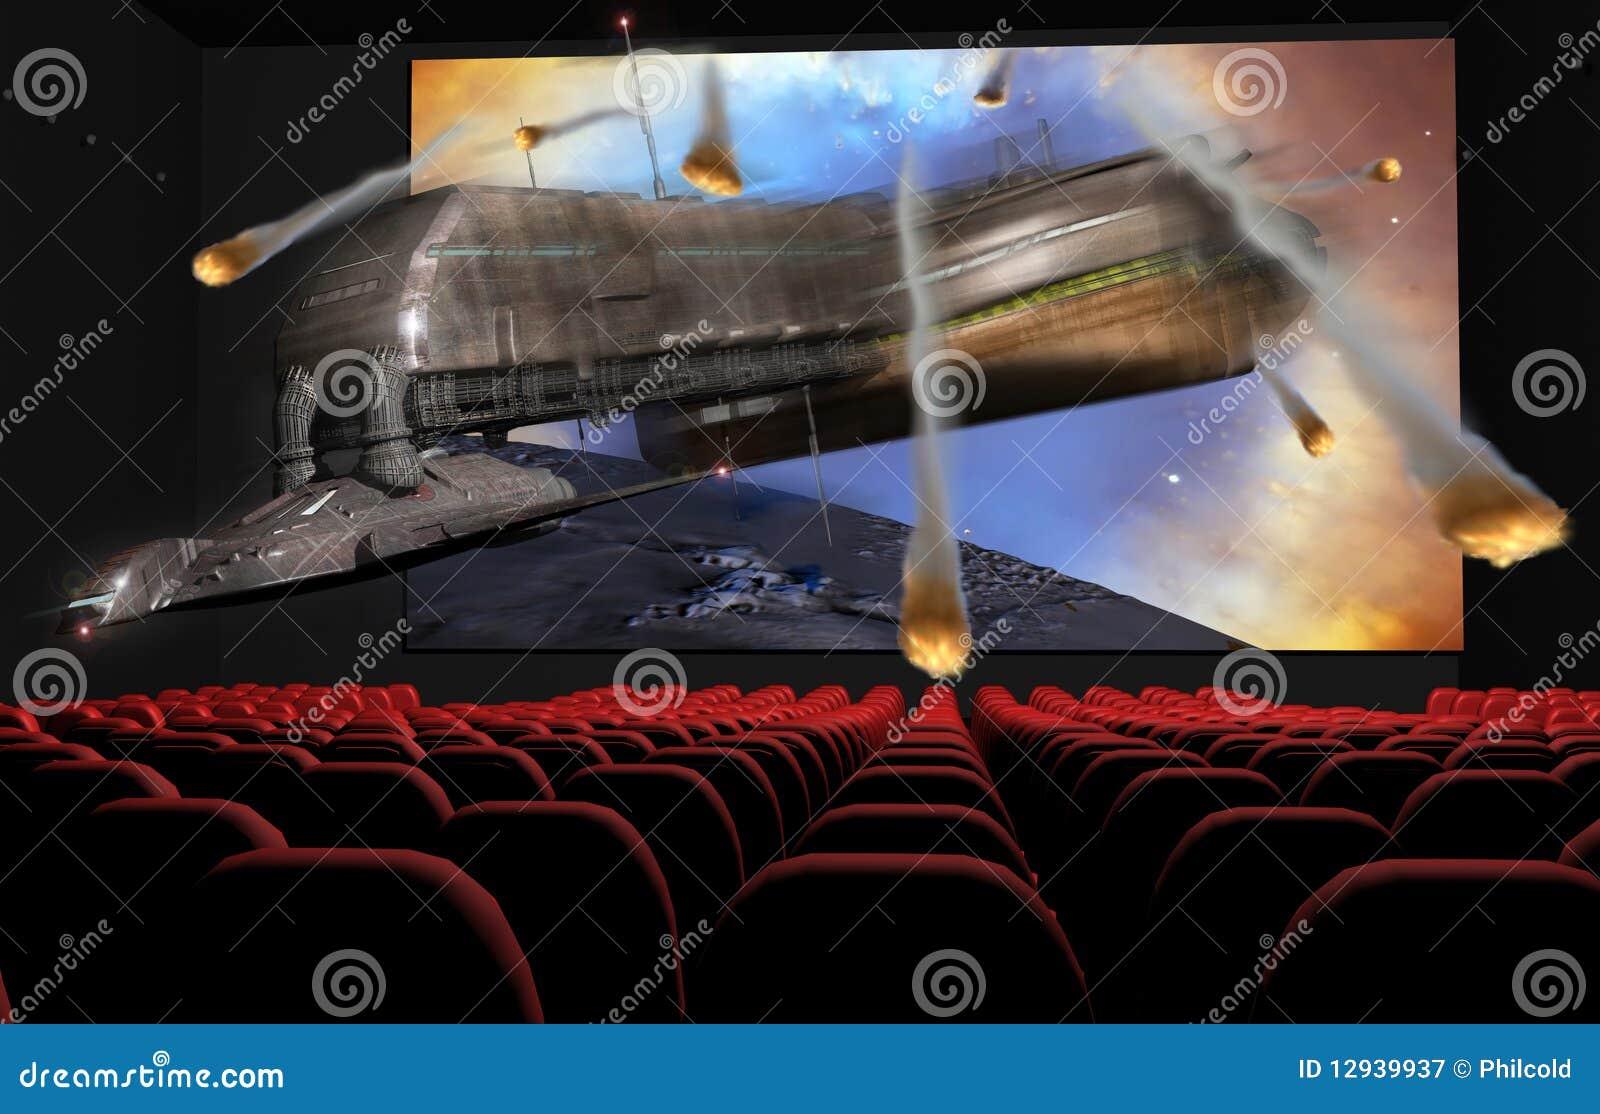 3d Cinema Royalty Free Stock Photography Image 12939937